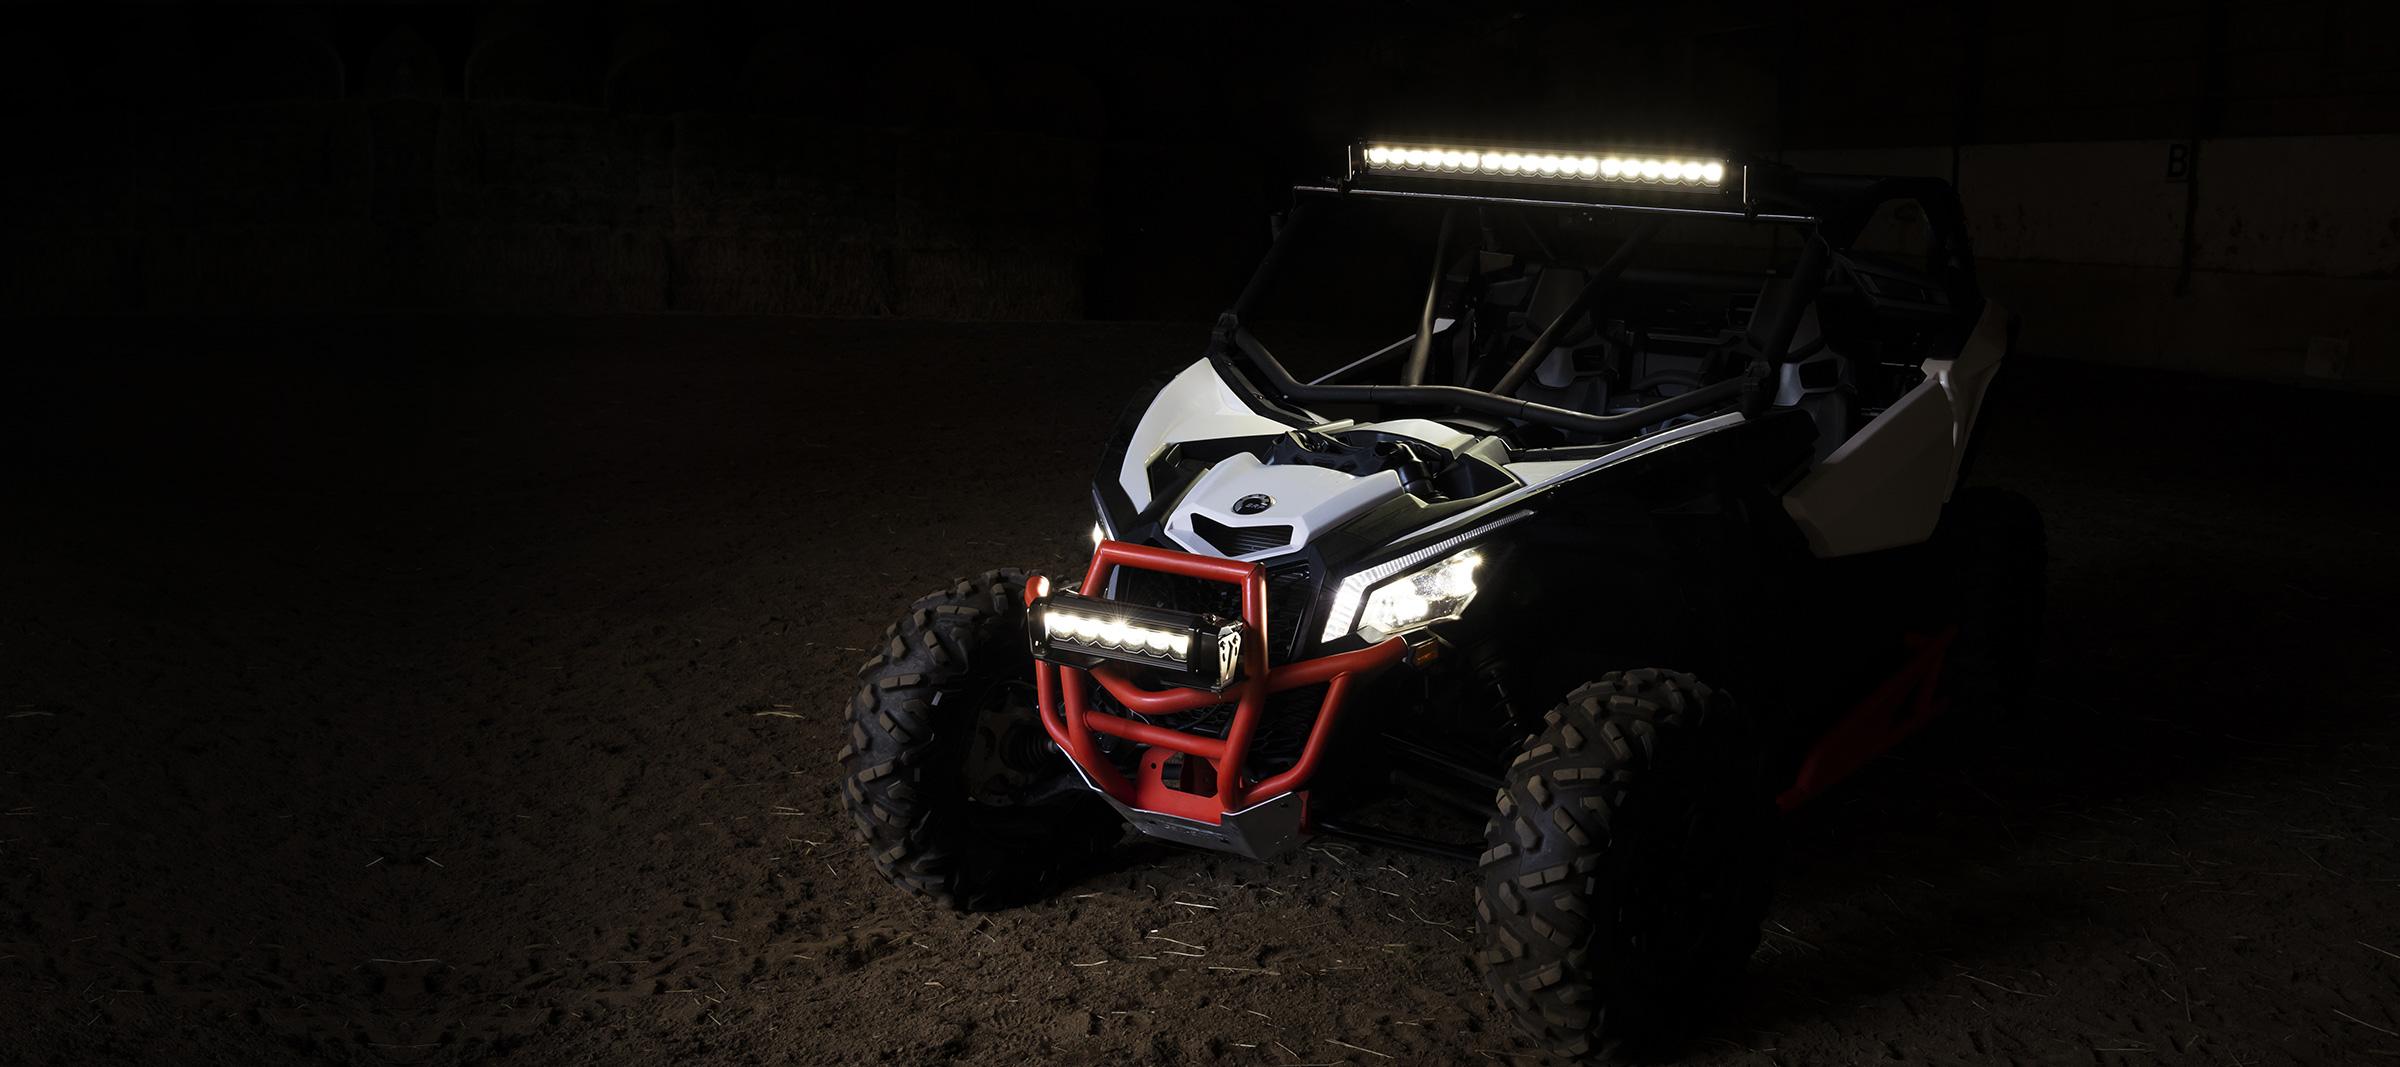 led light bar ATV side by side offroad best lighting